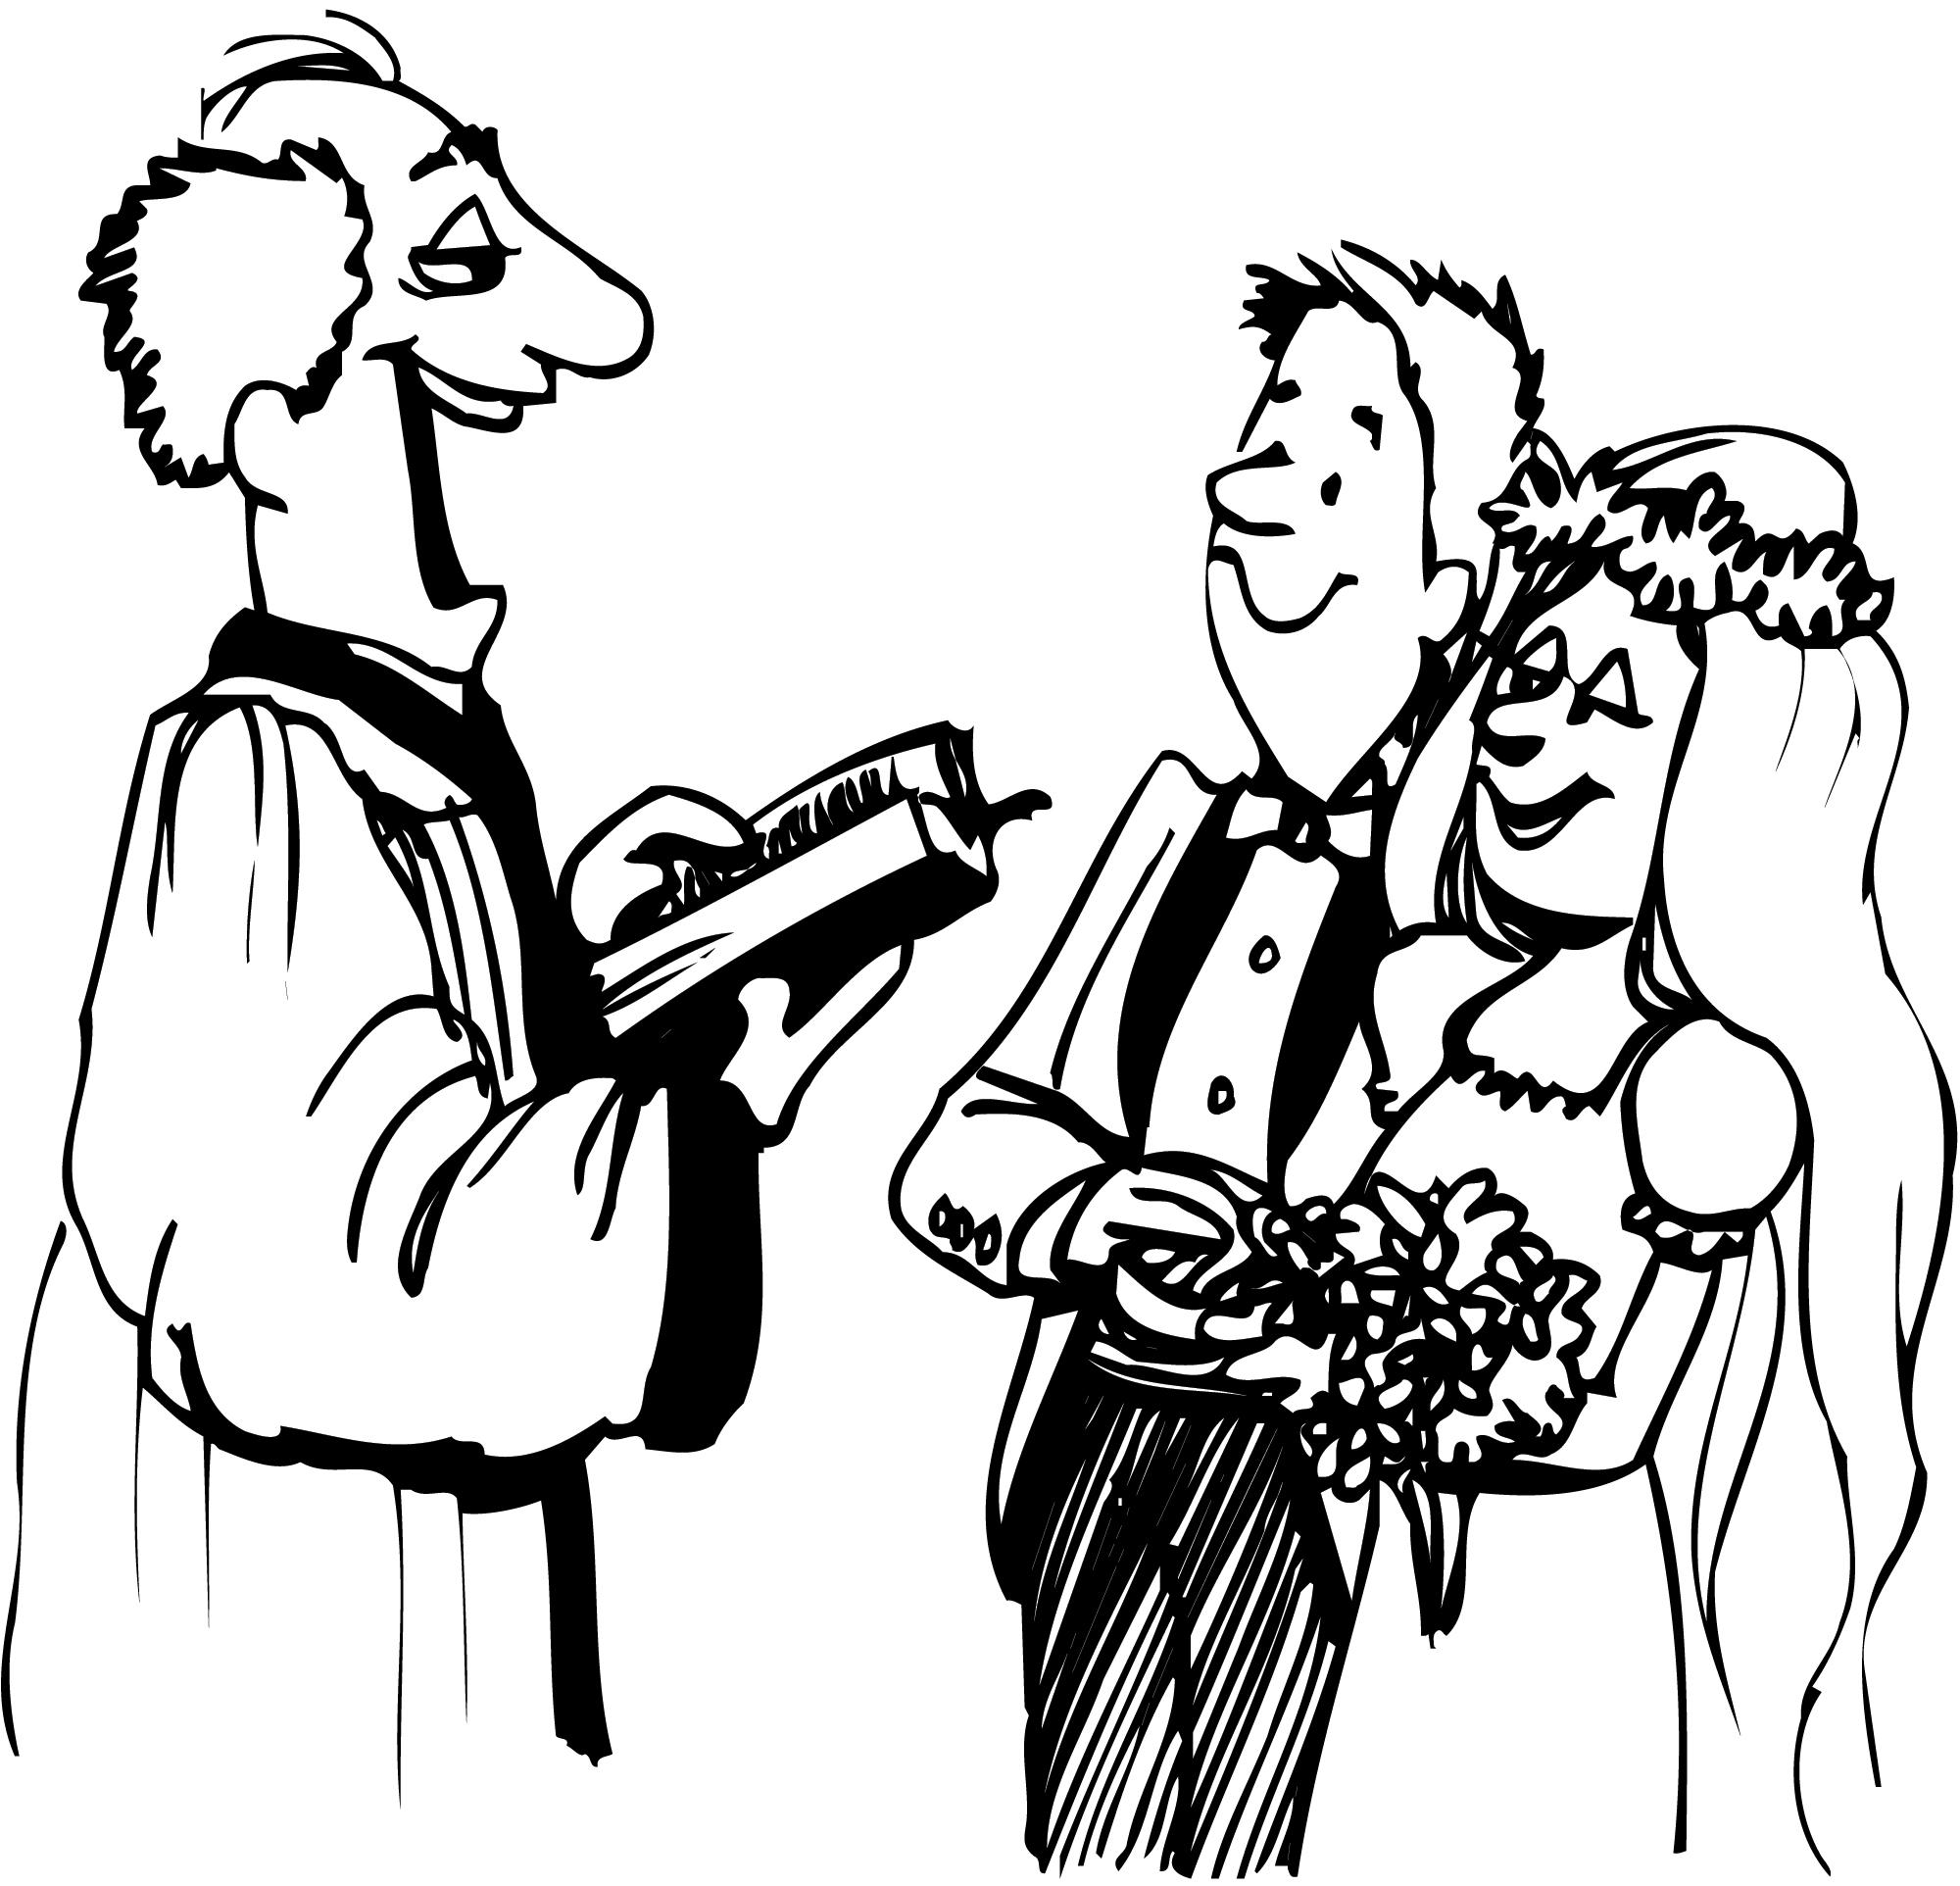 Weddingclipart-Weddingclipart-7